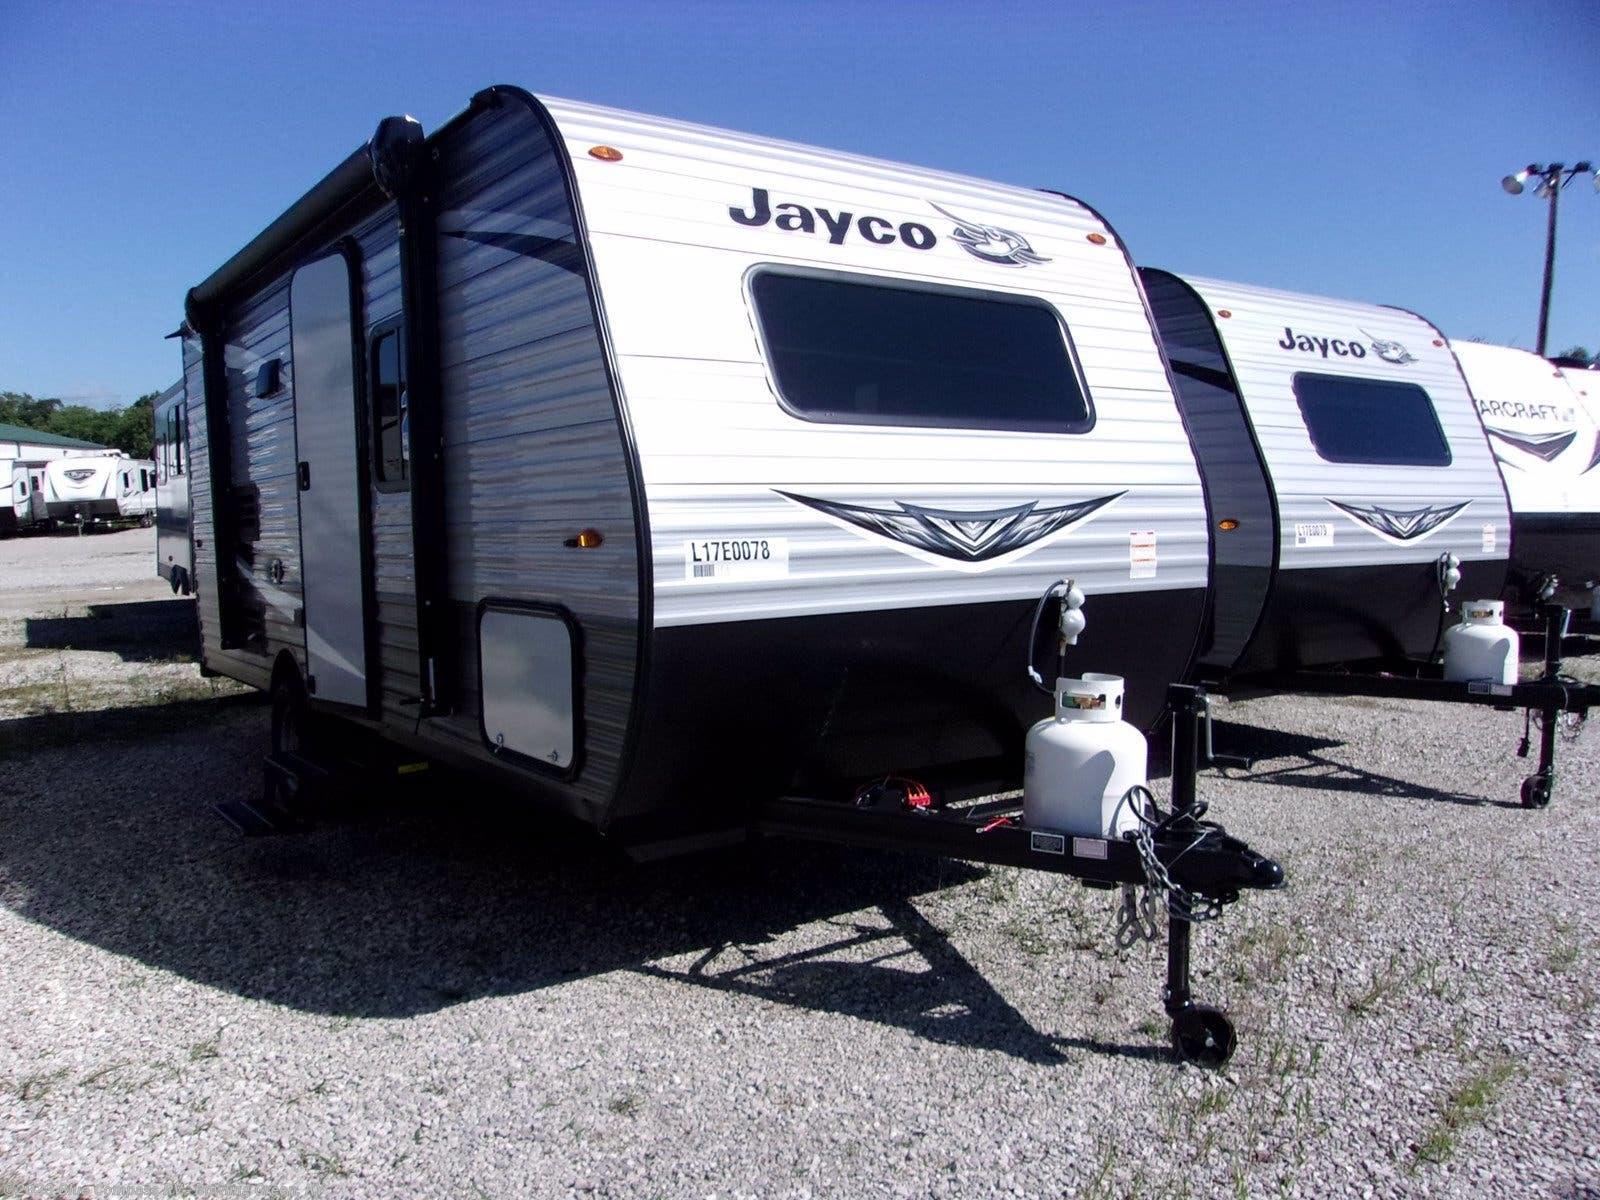 Bowling Green Halloween 2020 2020 Jayco Jay Flight SLX 7 RV for Sale in Bowling Green, KY 42101